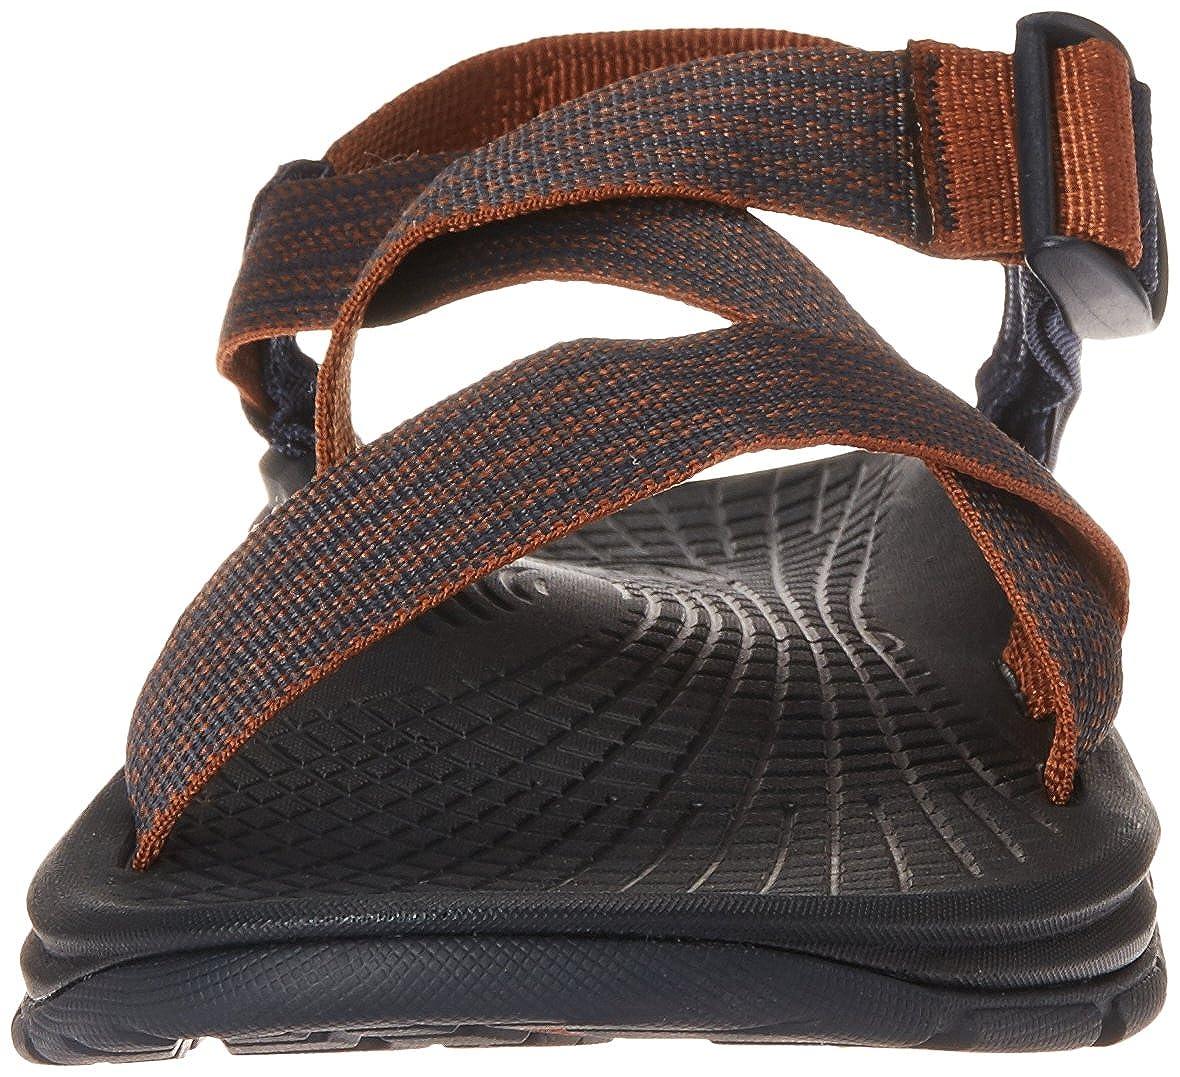 Chaco Men's Zvolv Sport Sandal, Stitch Cafe, 9 Medium US US US 462a36